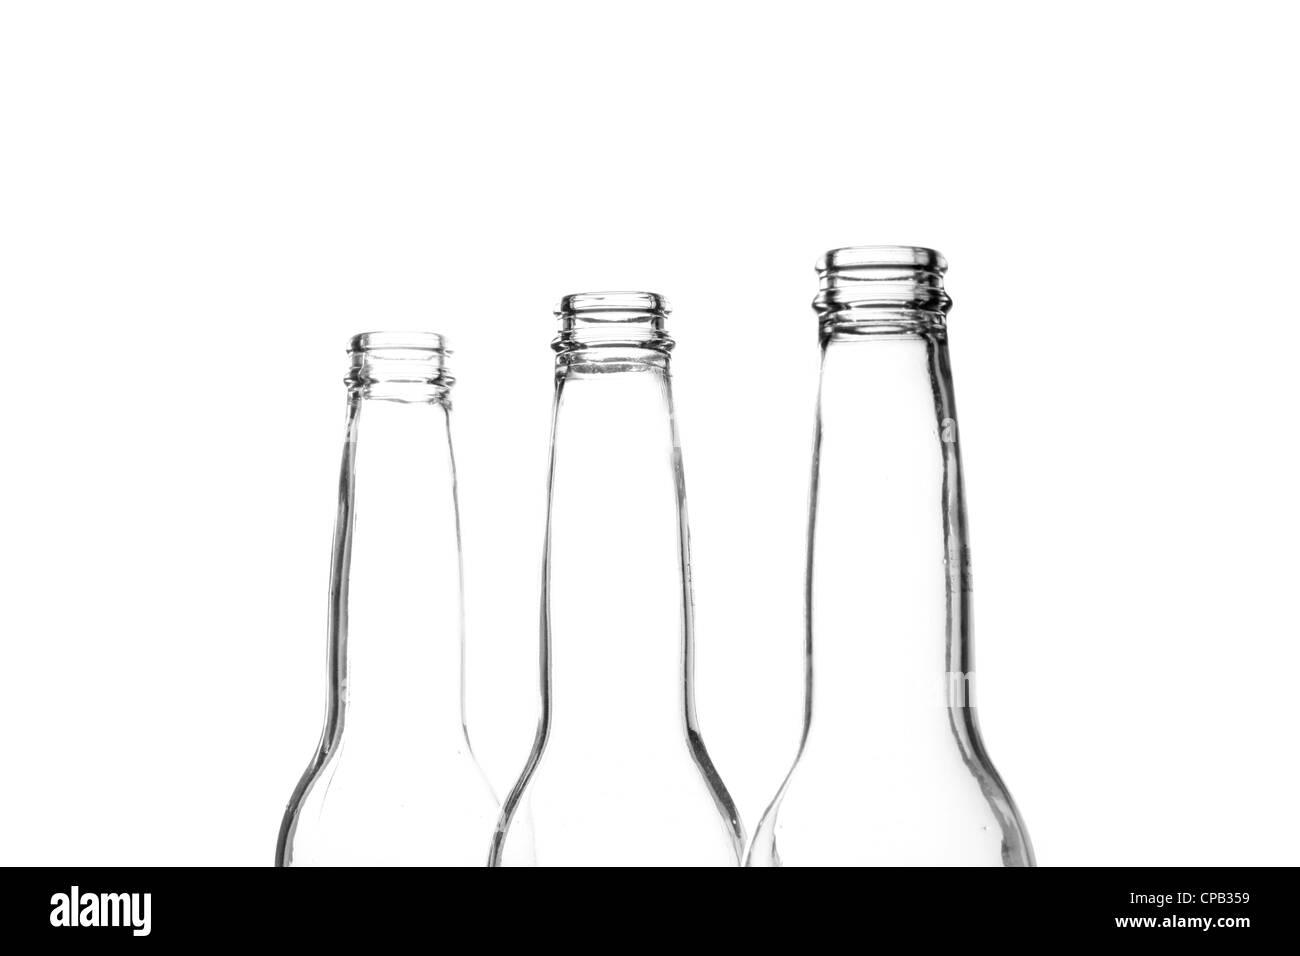 Three beer bottle necks on white Stock Photo